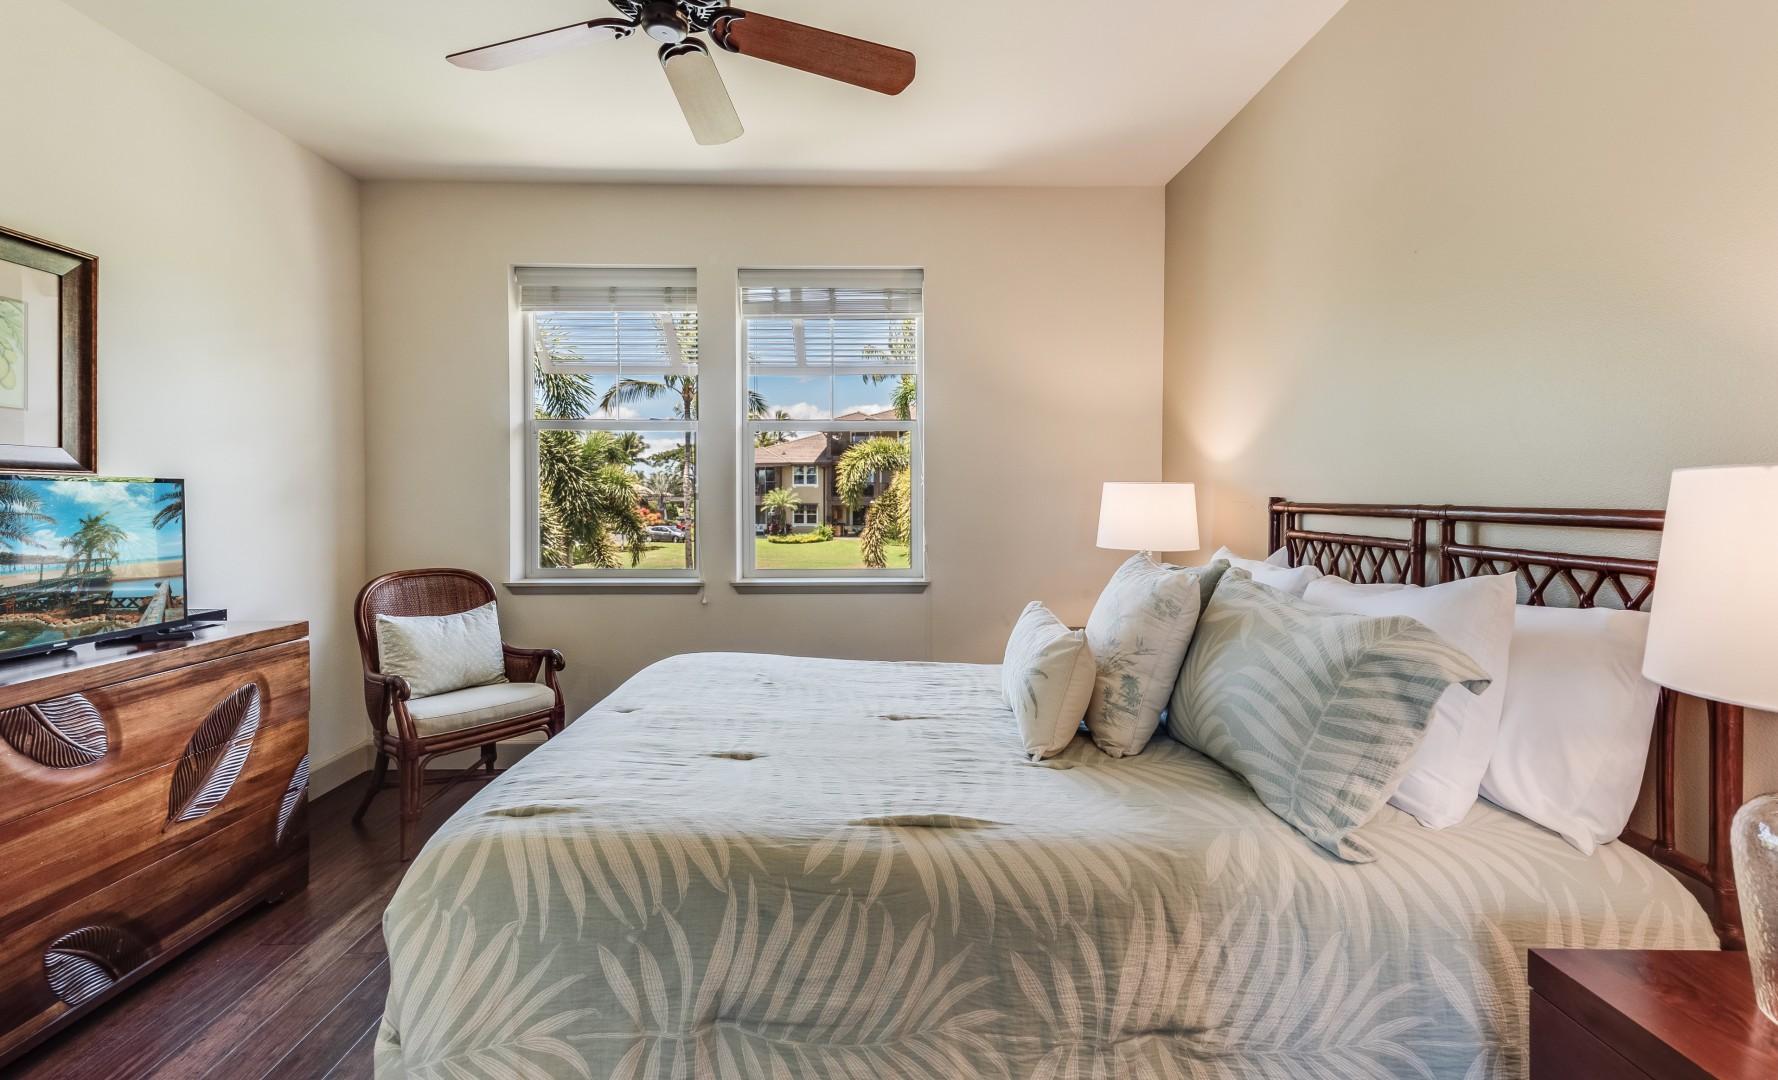 Downstairs guest bedroom 3